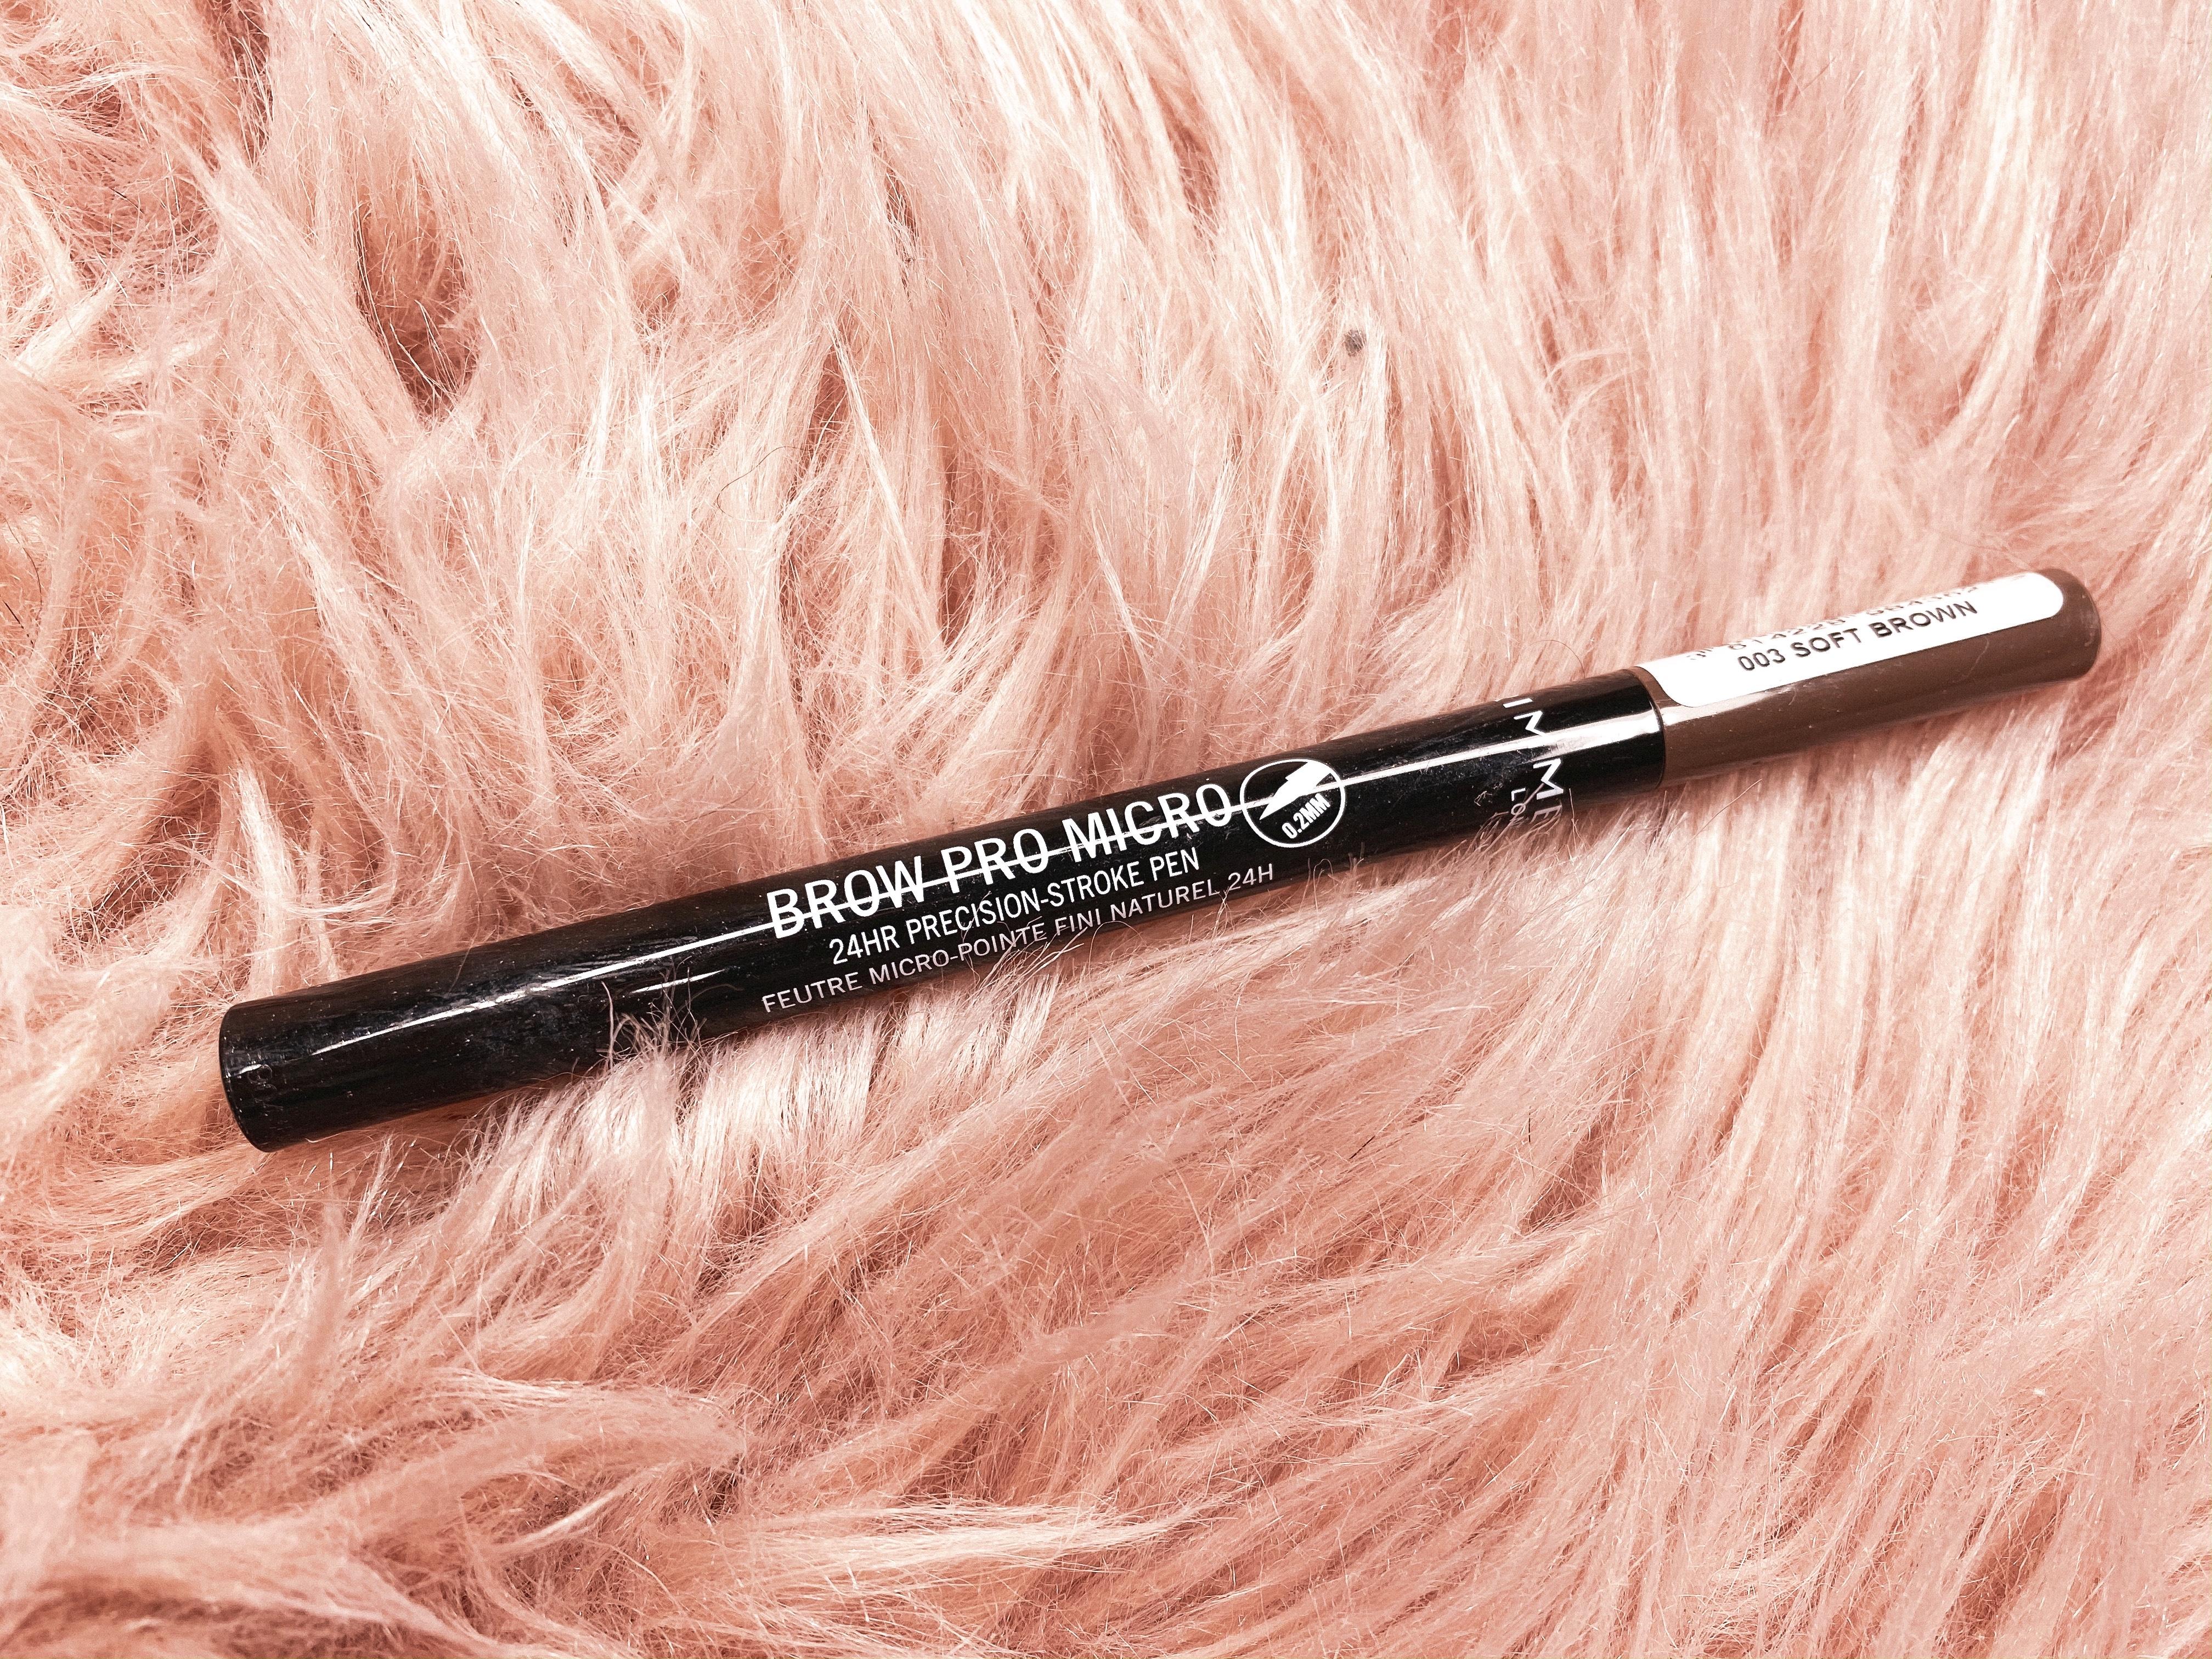 Rimmel brow pro micro pen